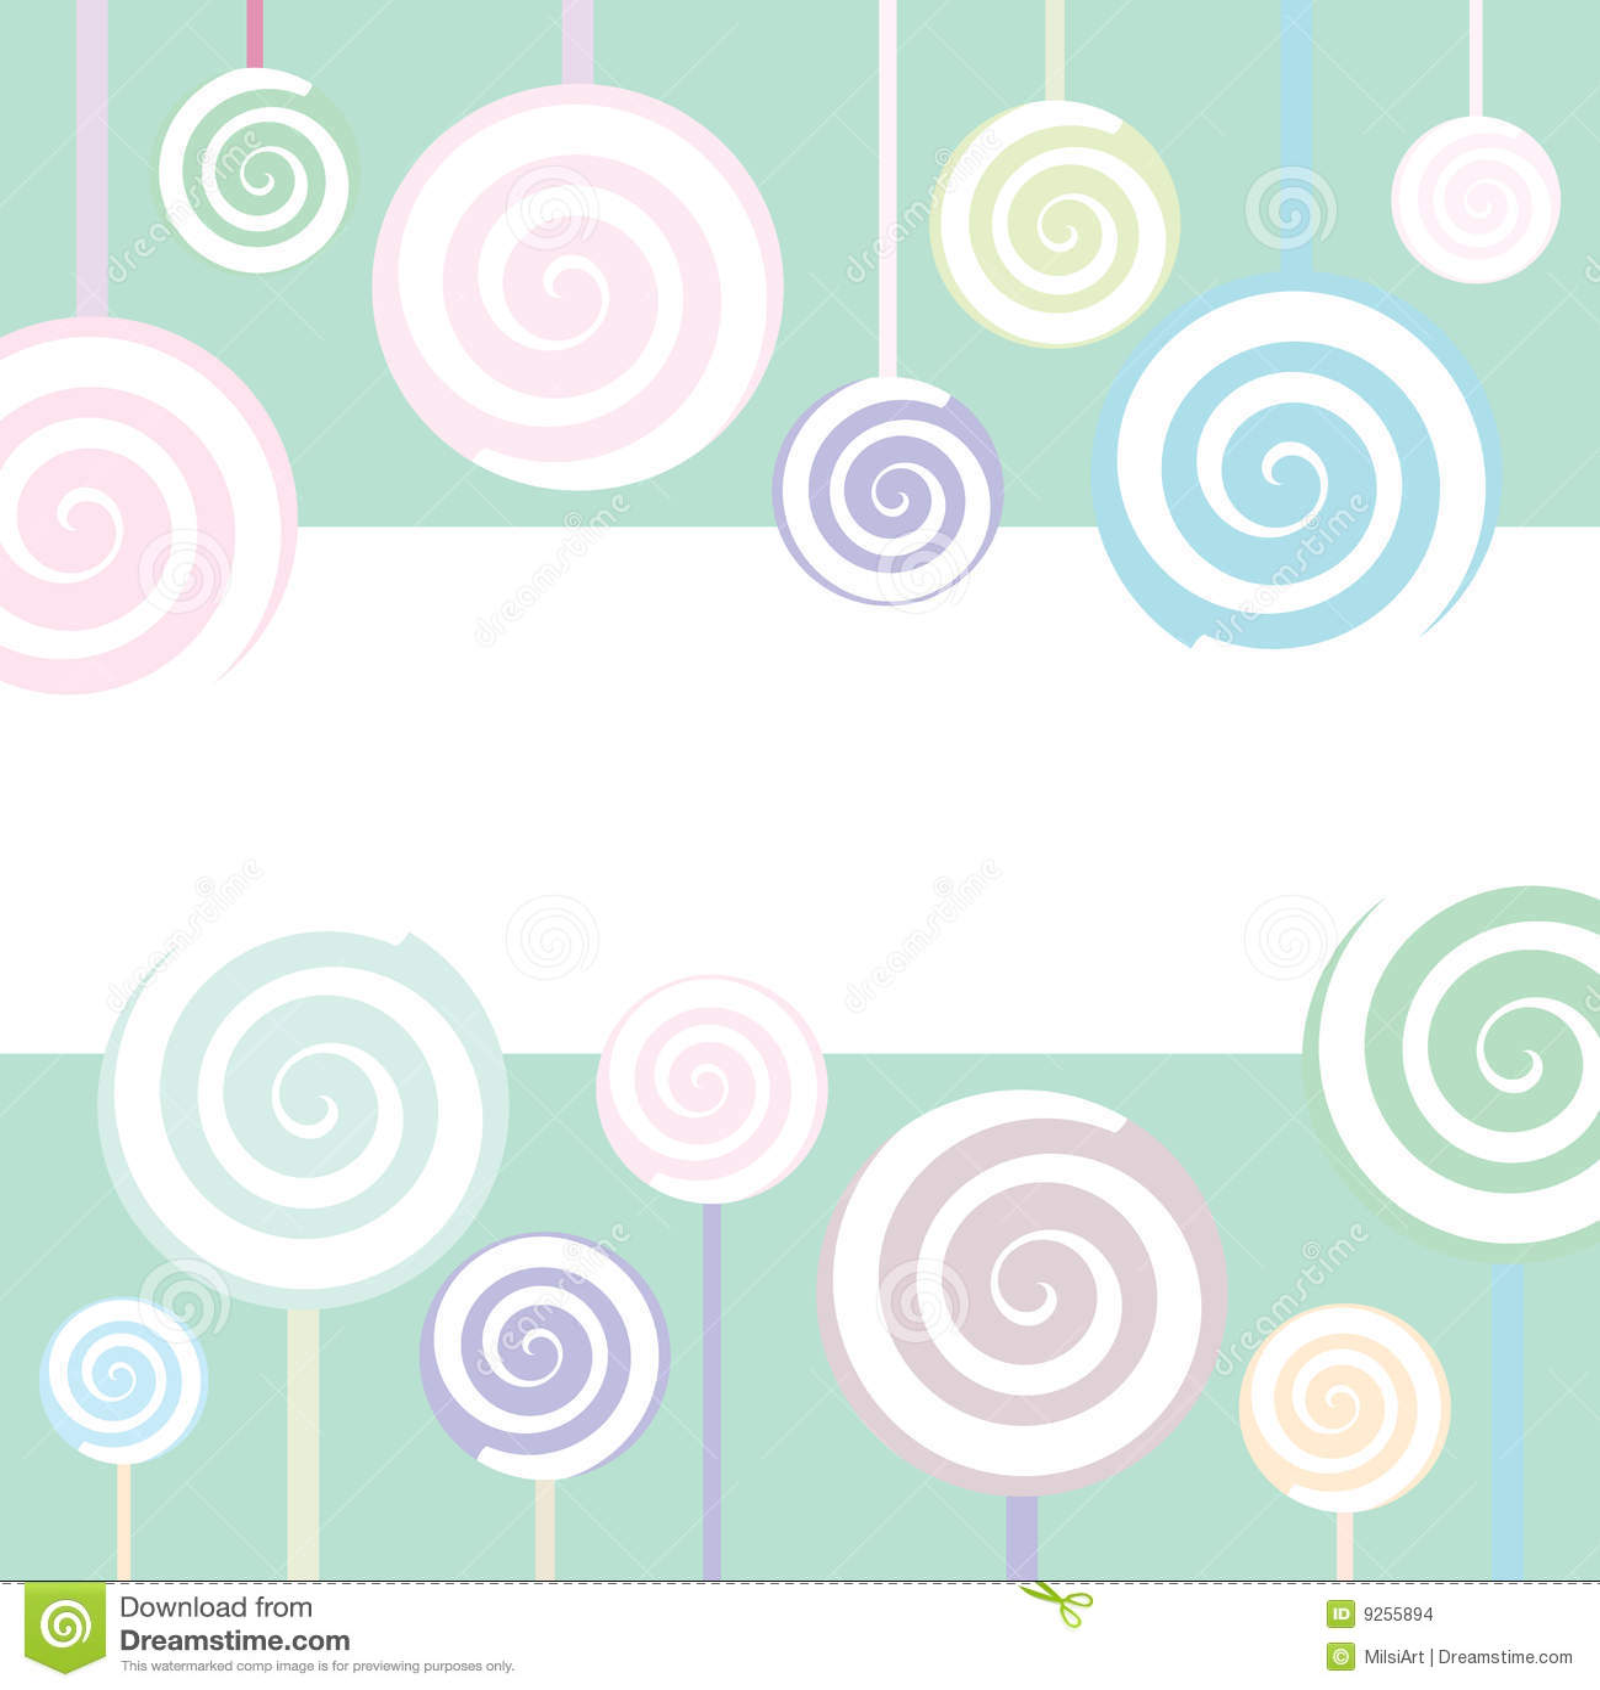 lollipop background stock images